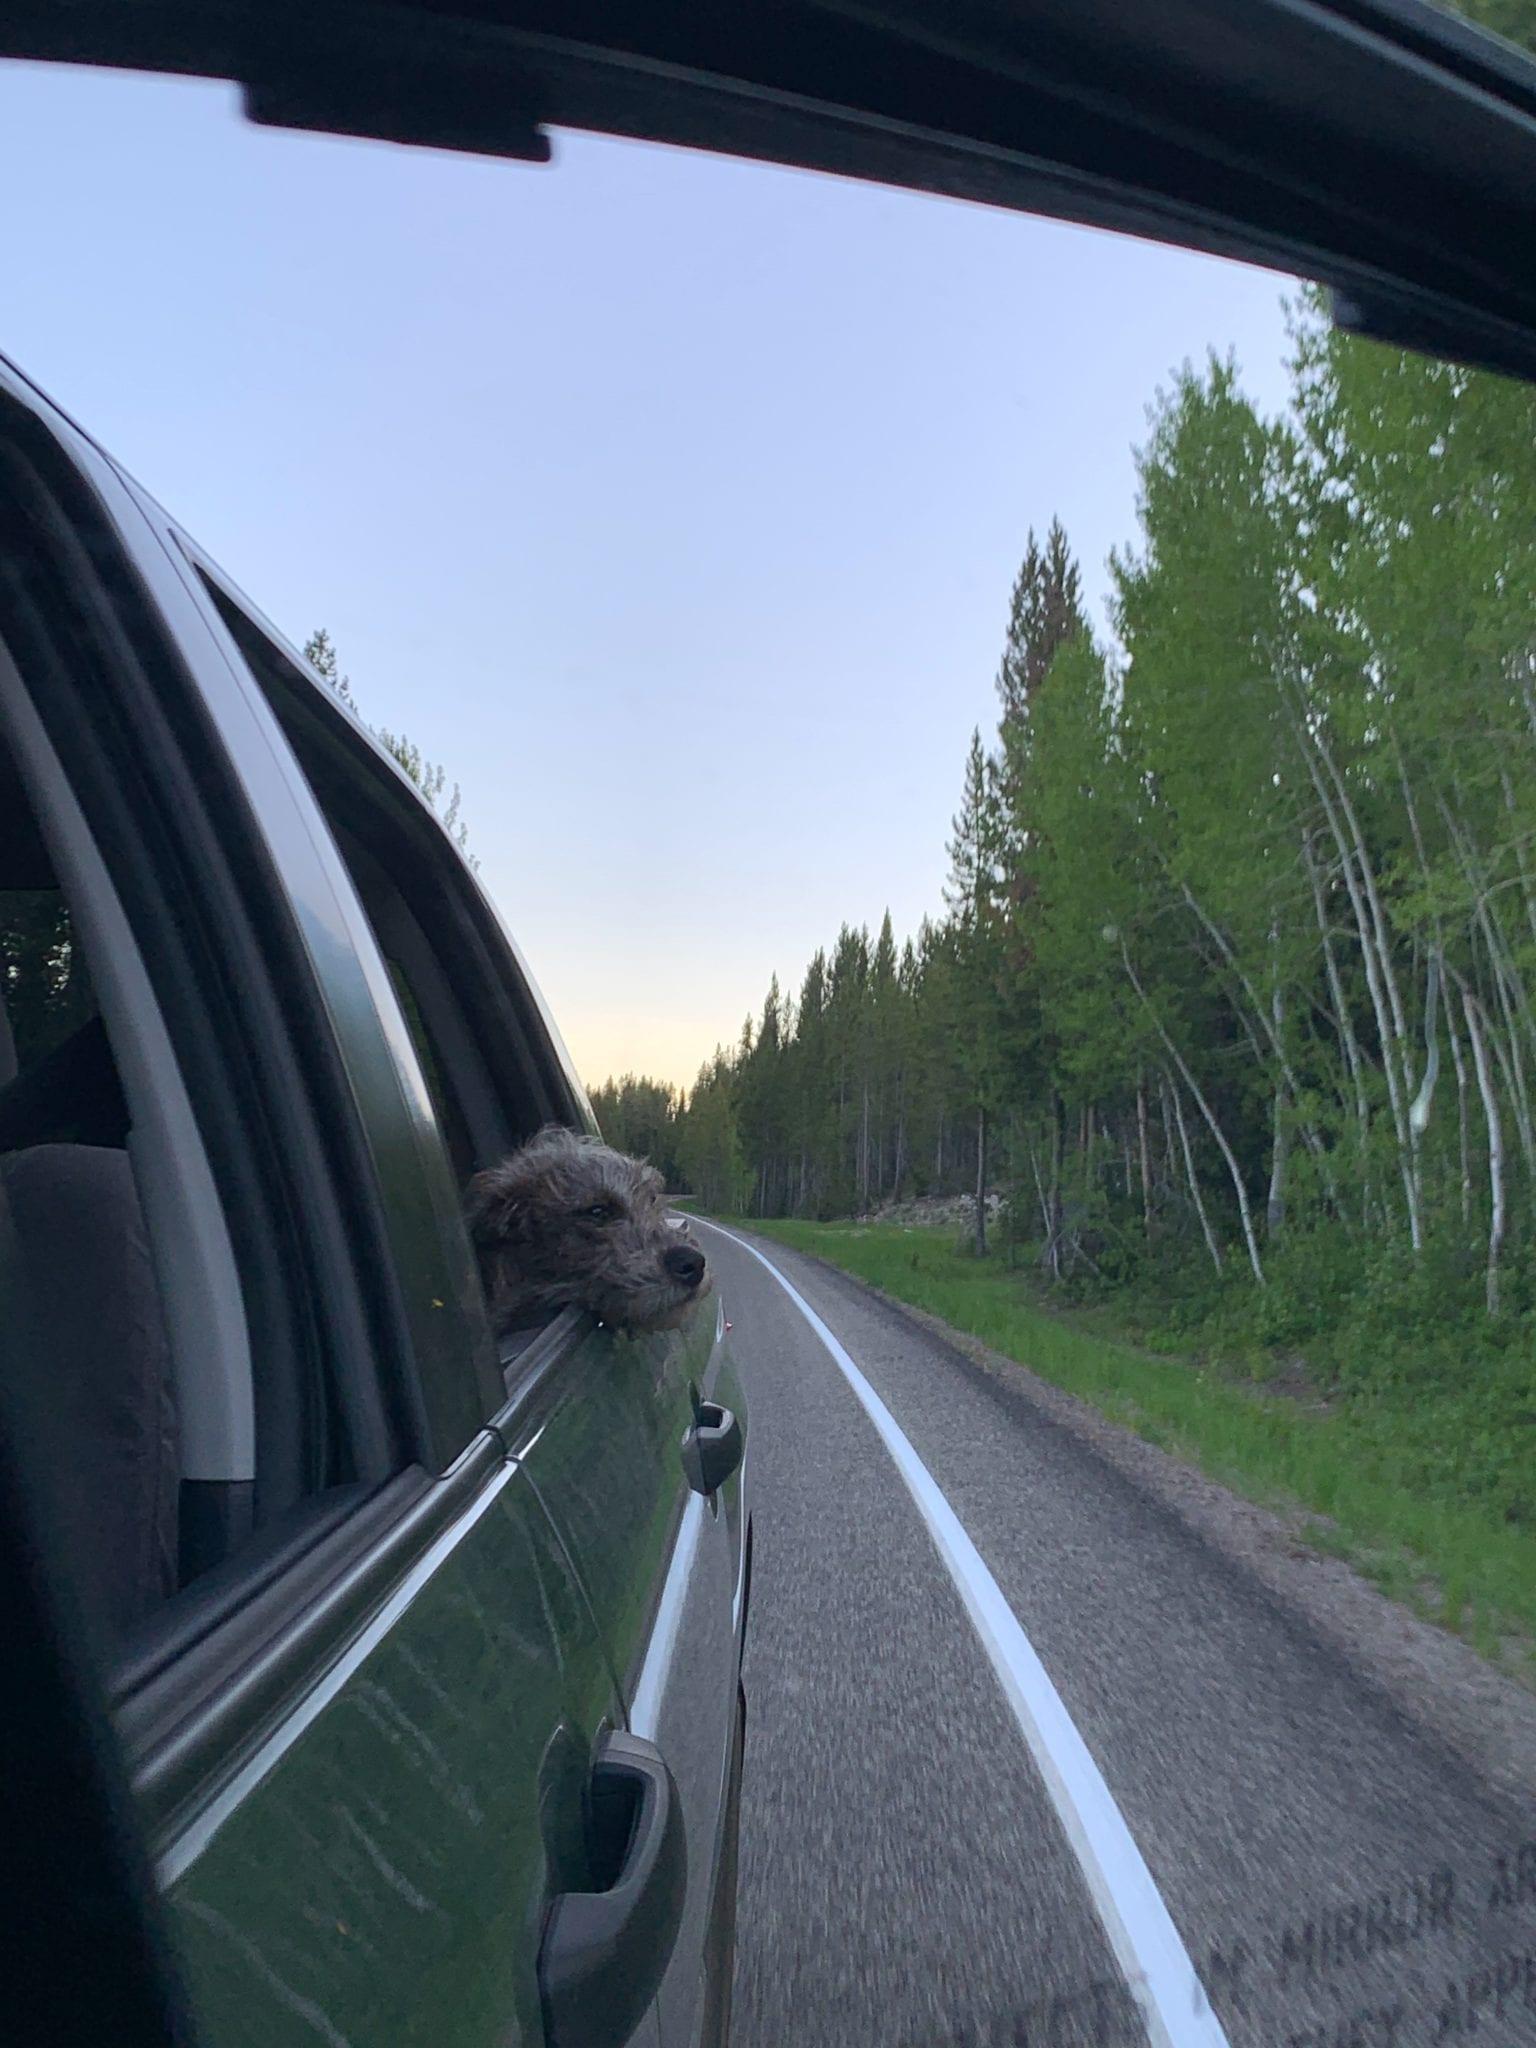 Huey taking in the fresh mountain air